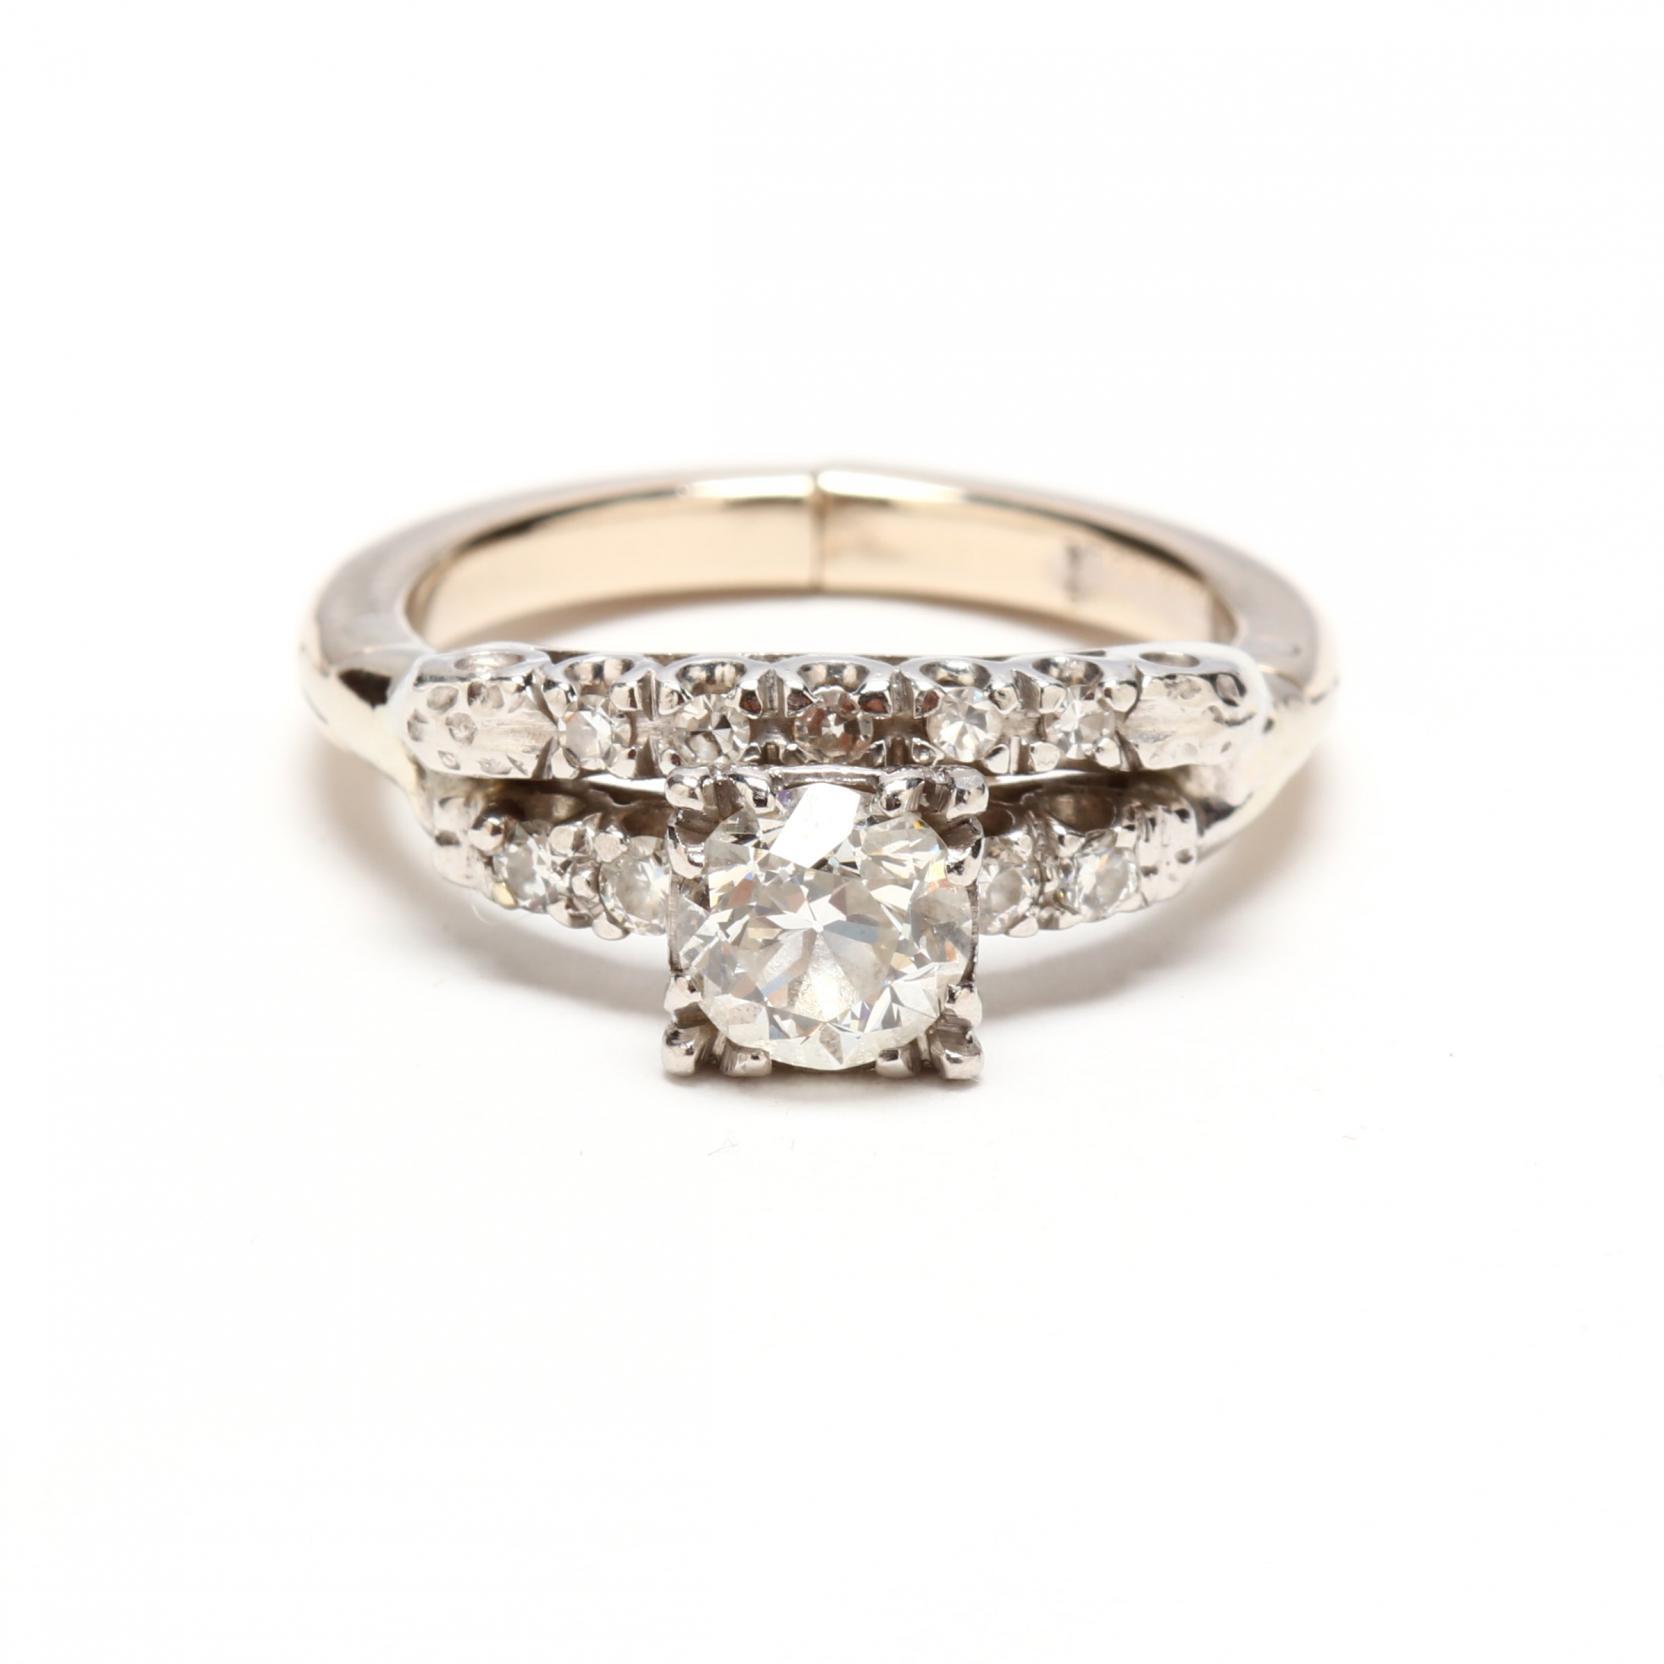 platinum-14kt-white-gold-and-diamond-wedding-set